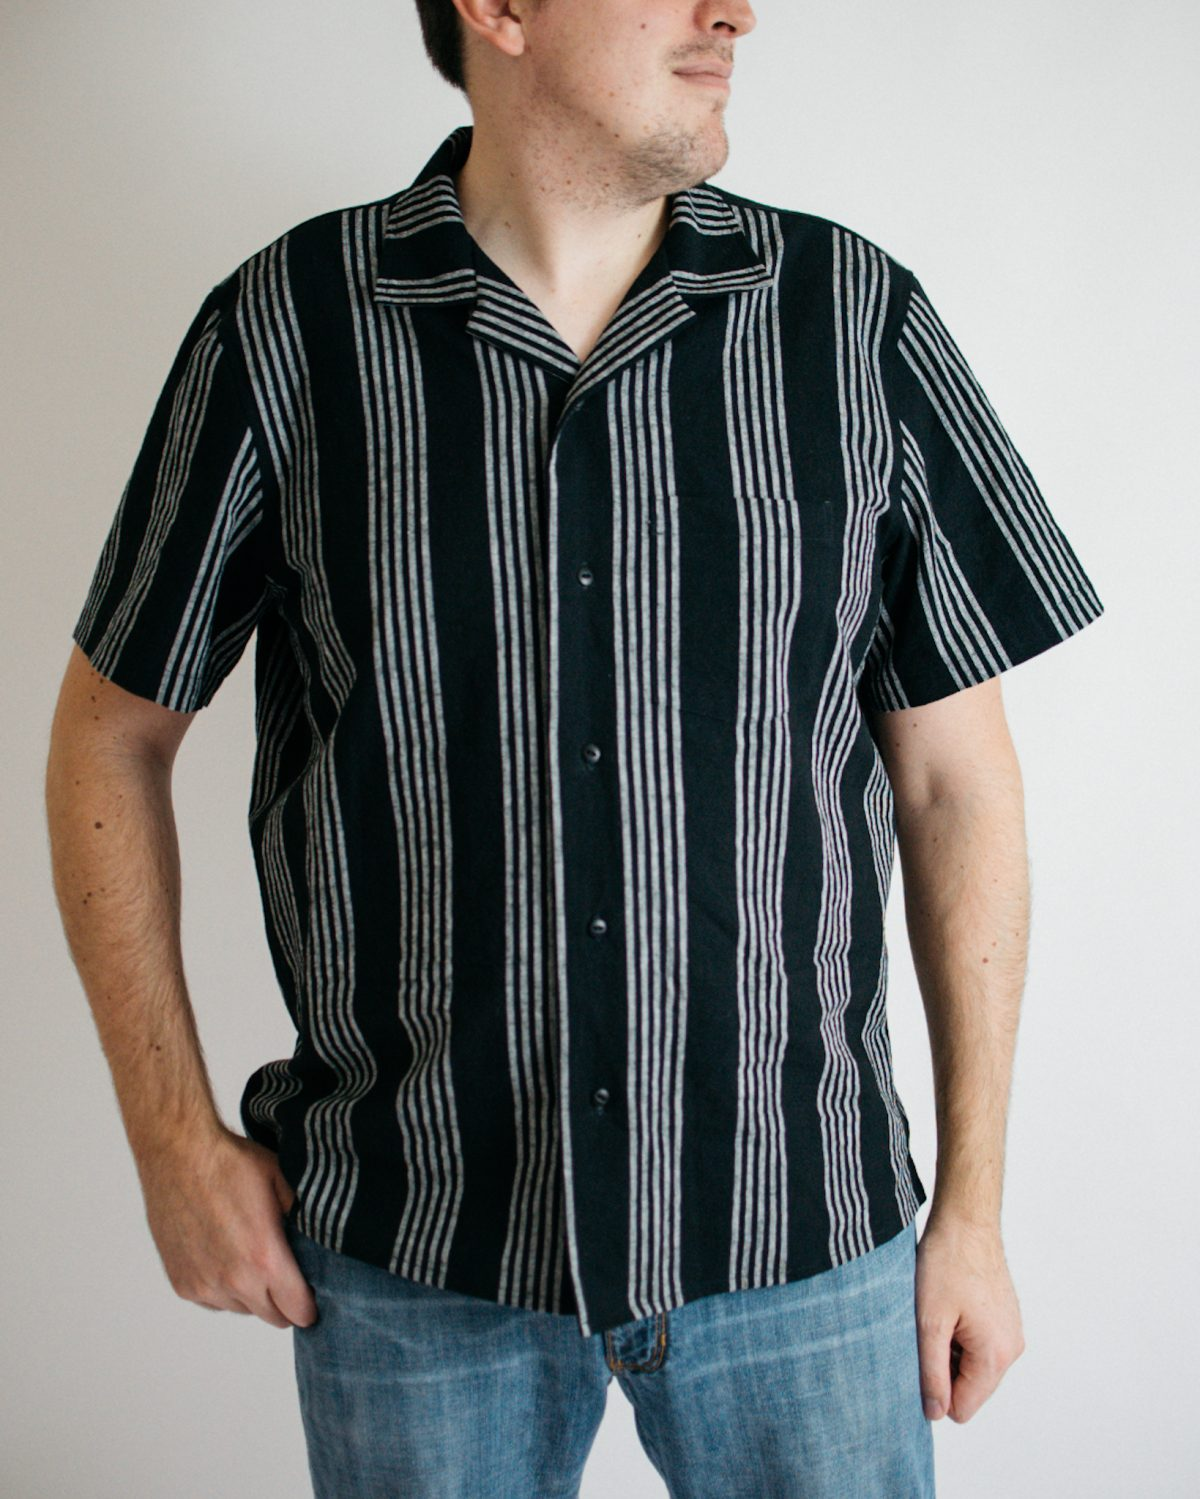 Men's Tropical Shirt